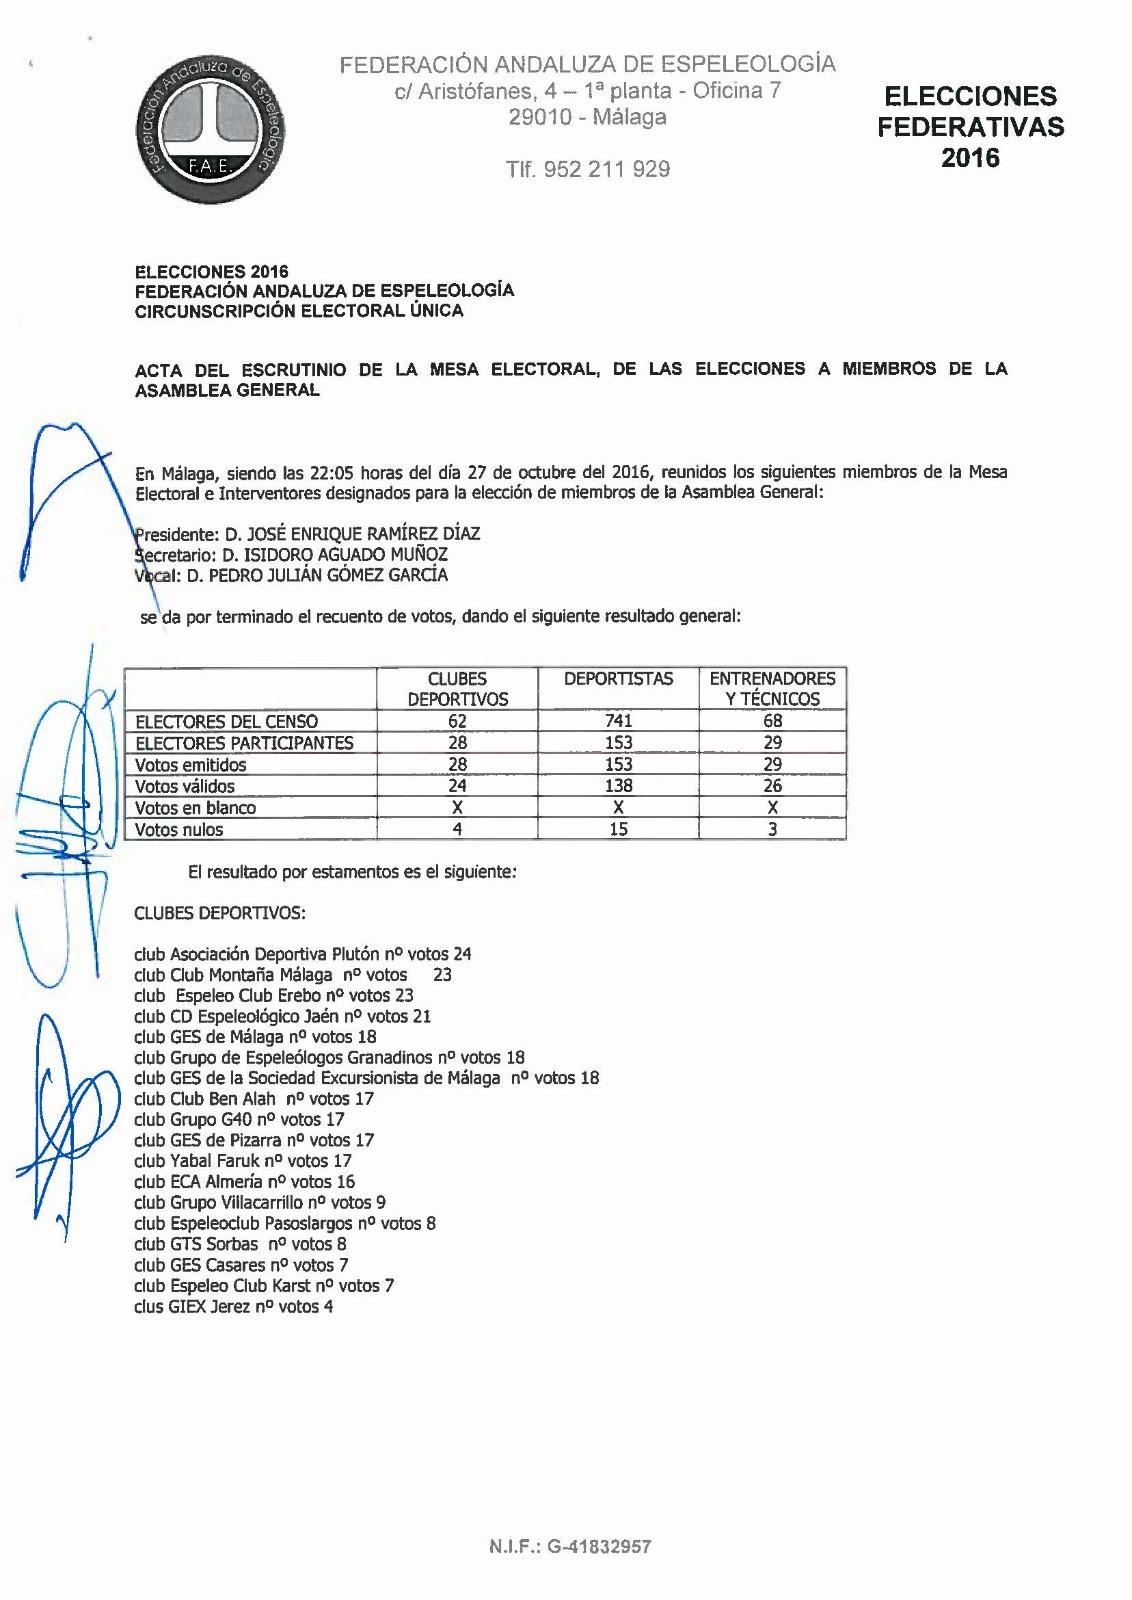 20161027-acta_electoral_fae_2016